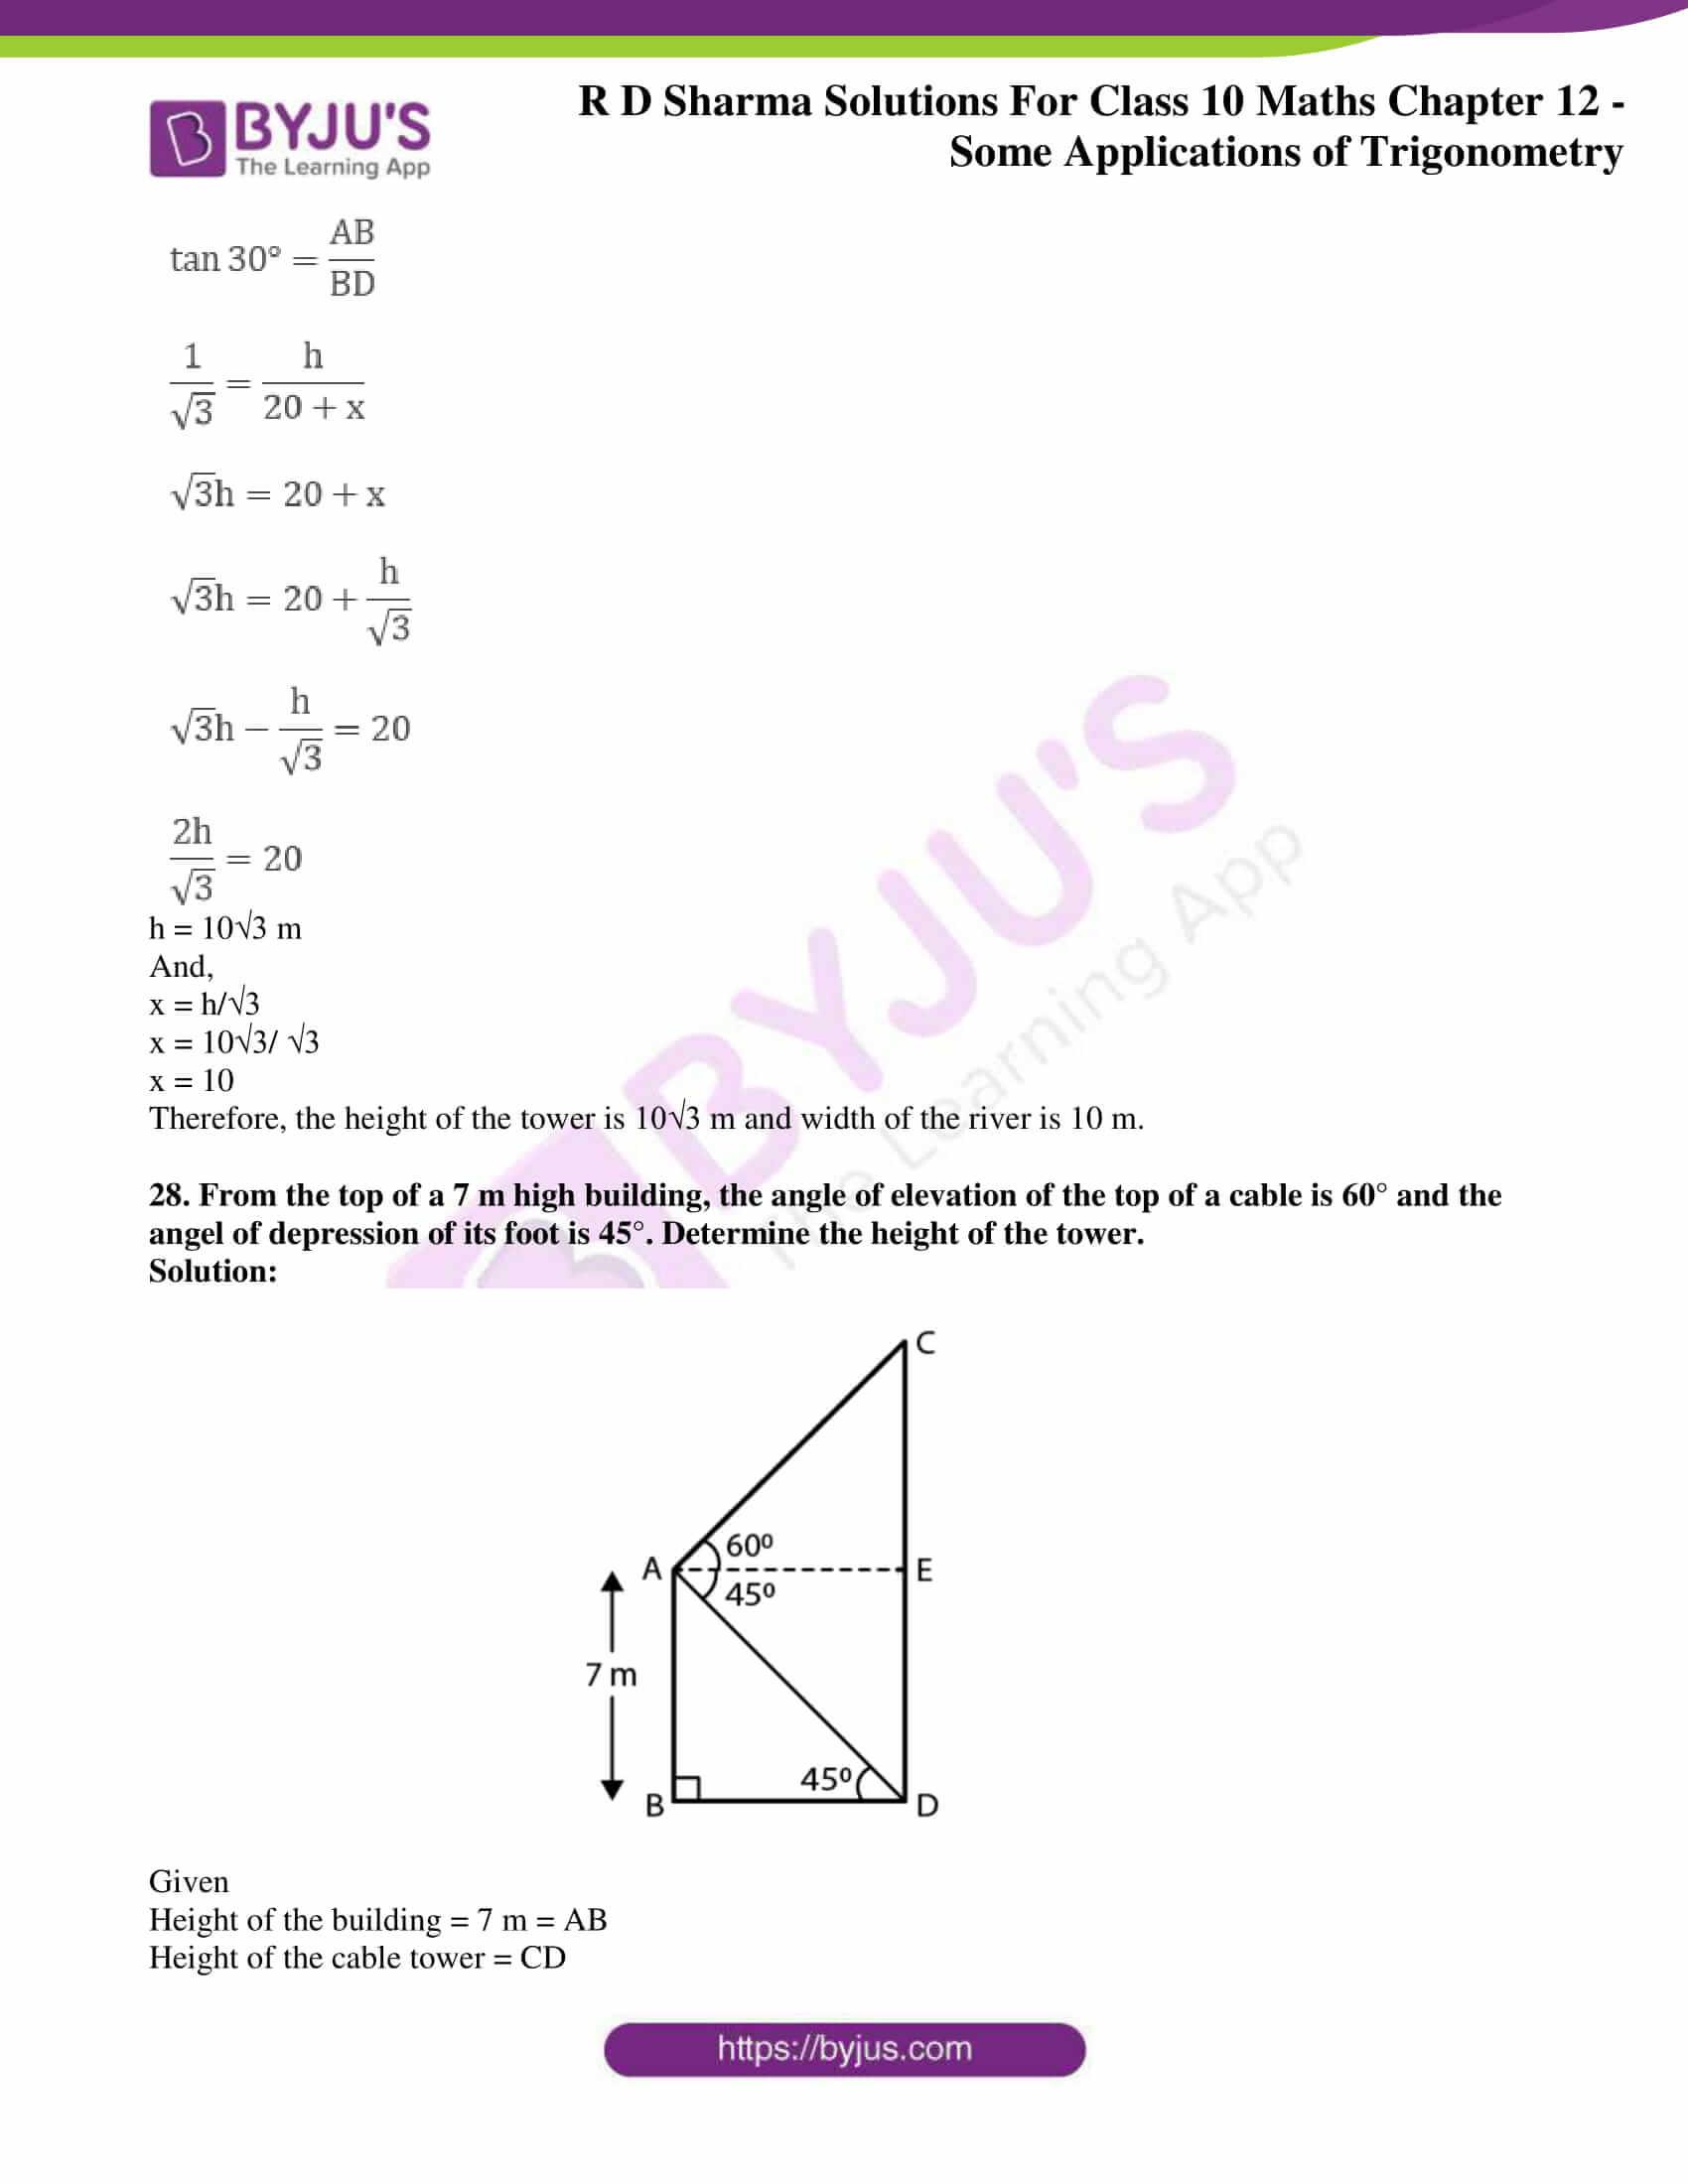 rd sharma class 10 chapter 12 applications trigonometry solutions 27